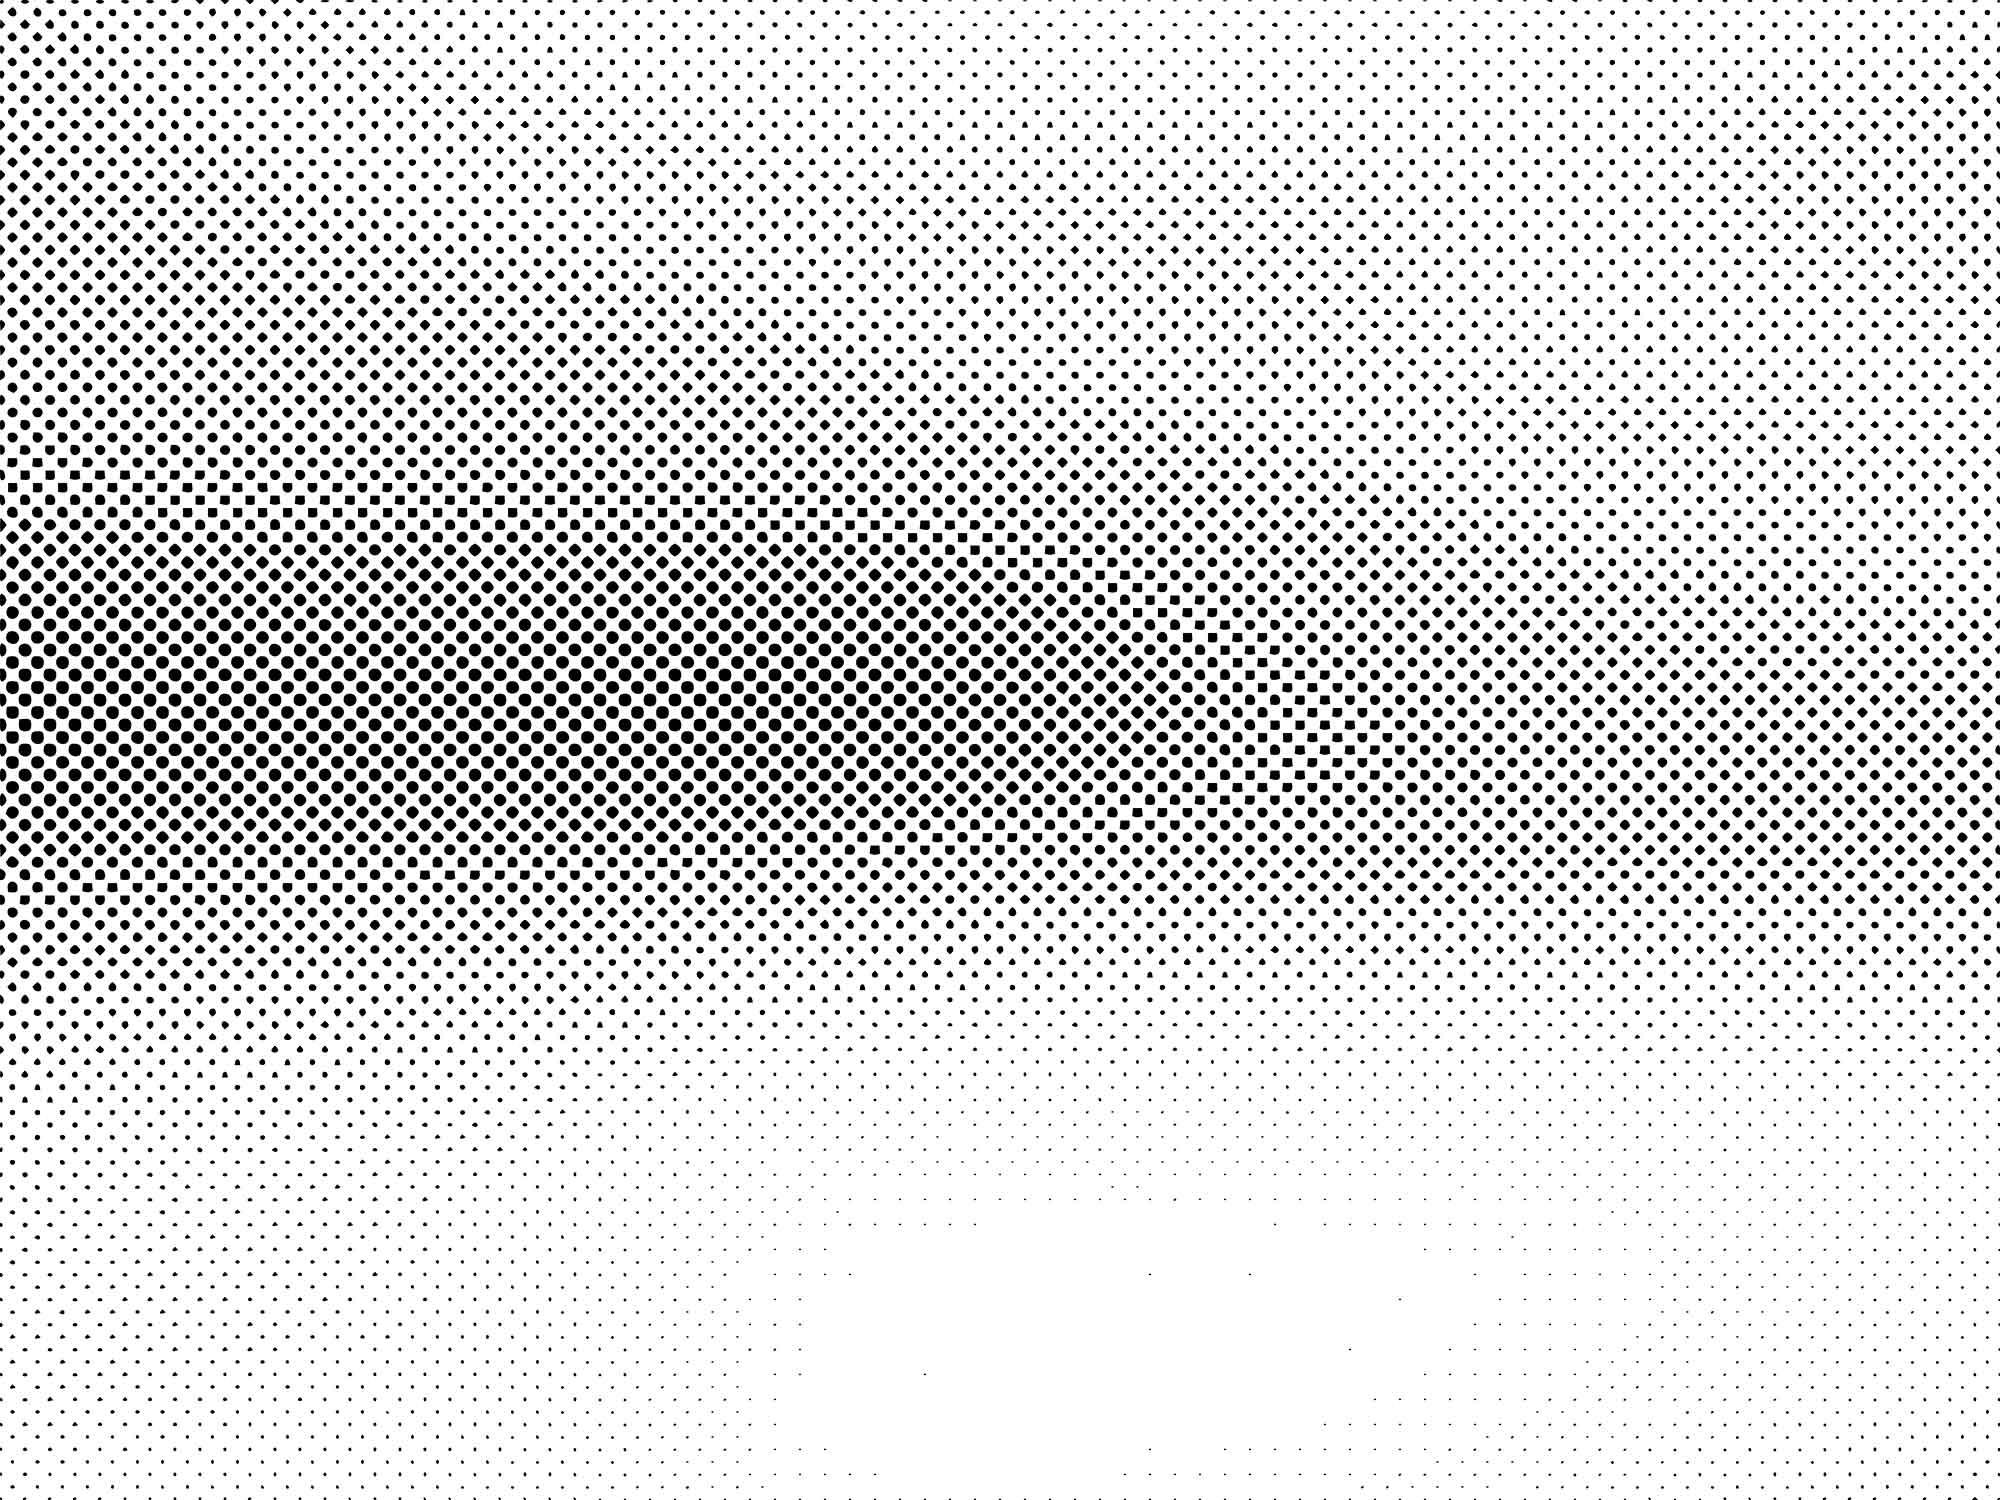 Halftone Dot Textures 7